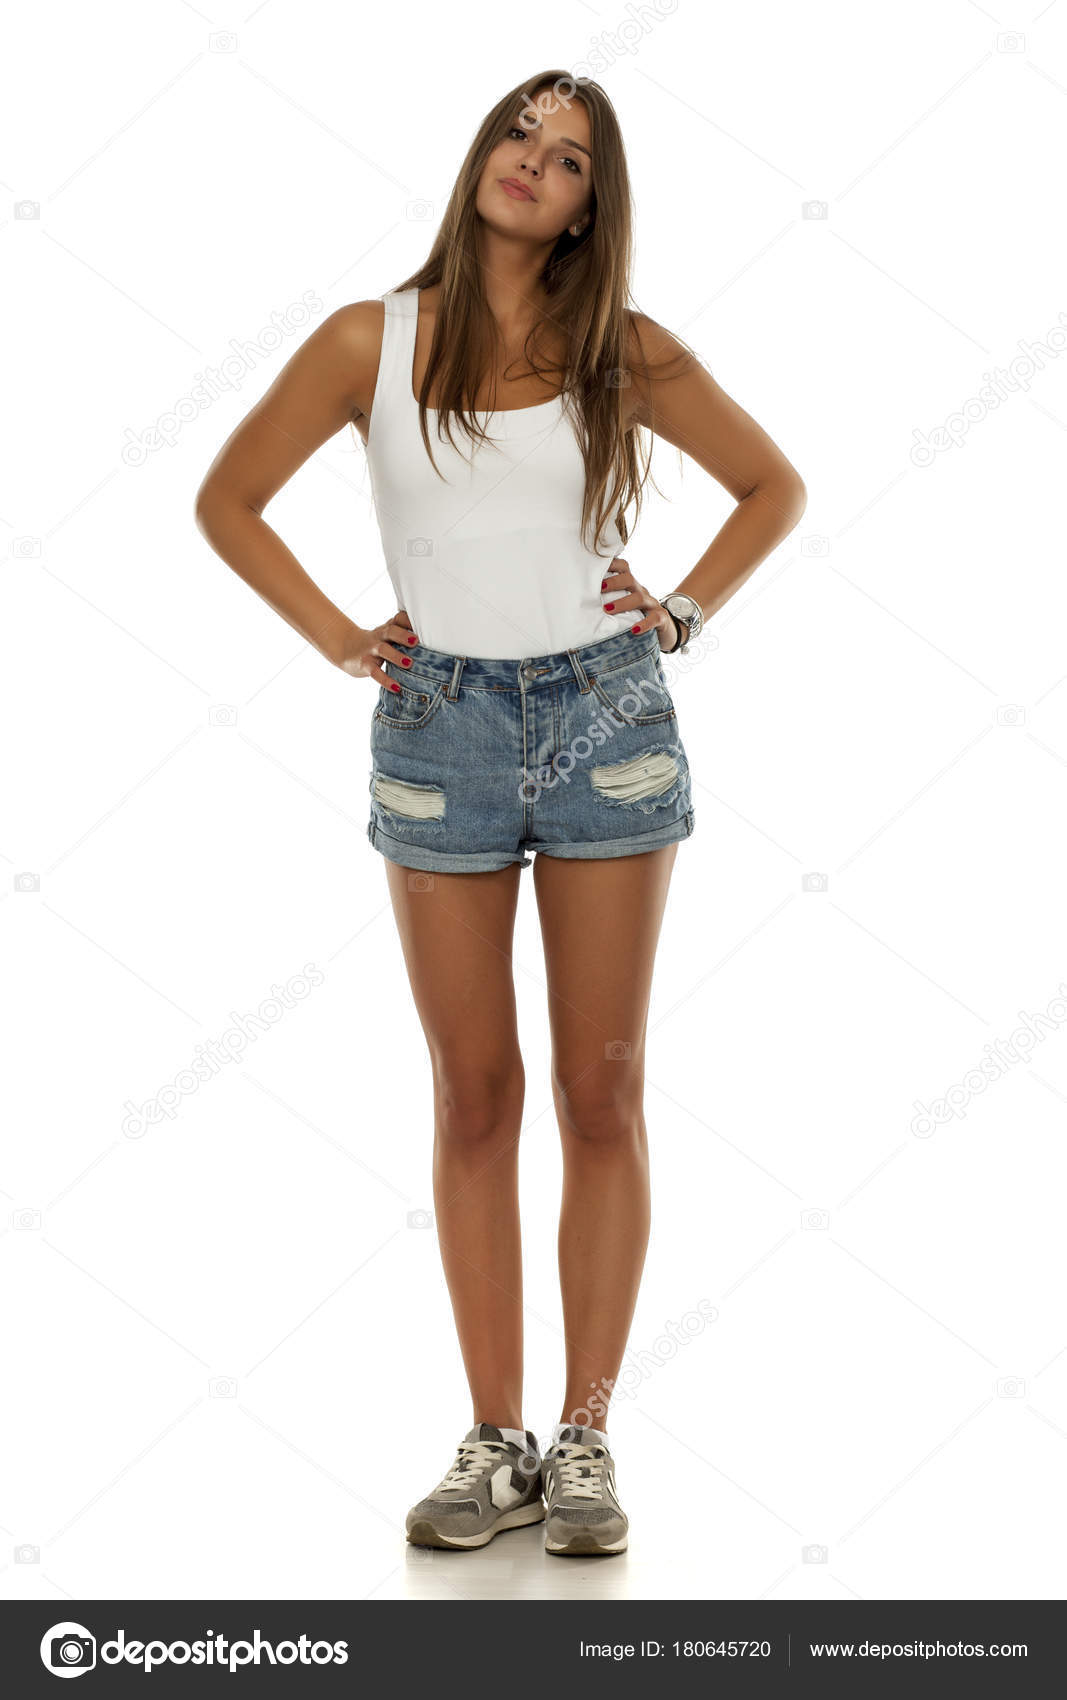 000e515022 Mujer Hermosa Joven Shorts Jeans Camisa Sin Mangas Zapatillas Deporte —  Fotos de Stock